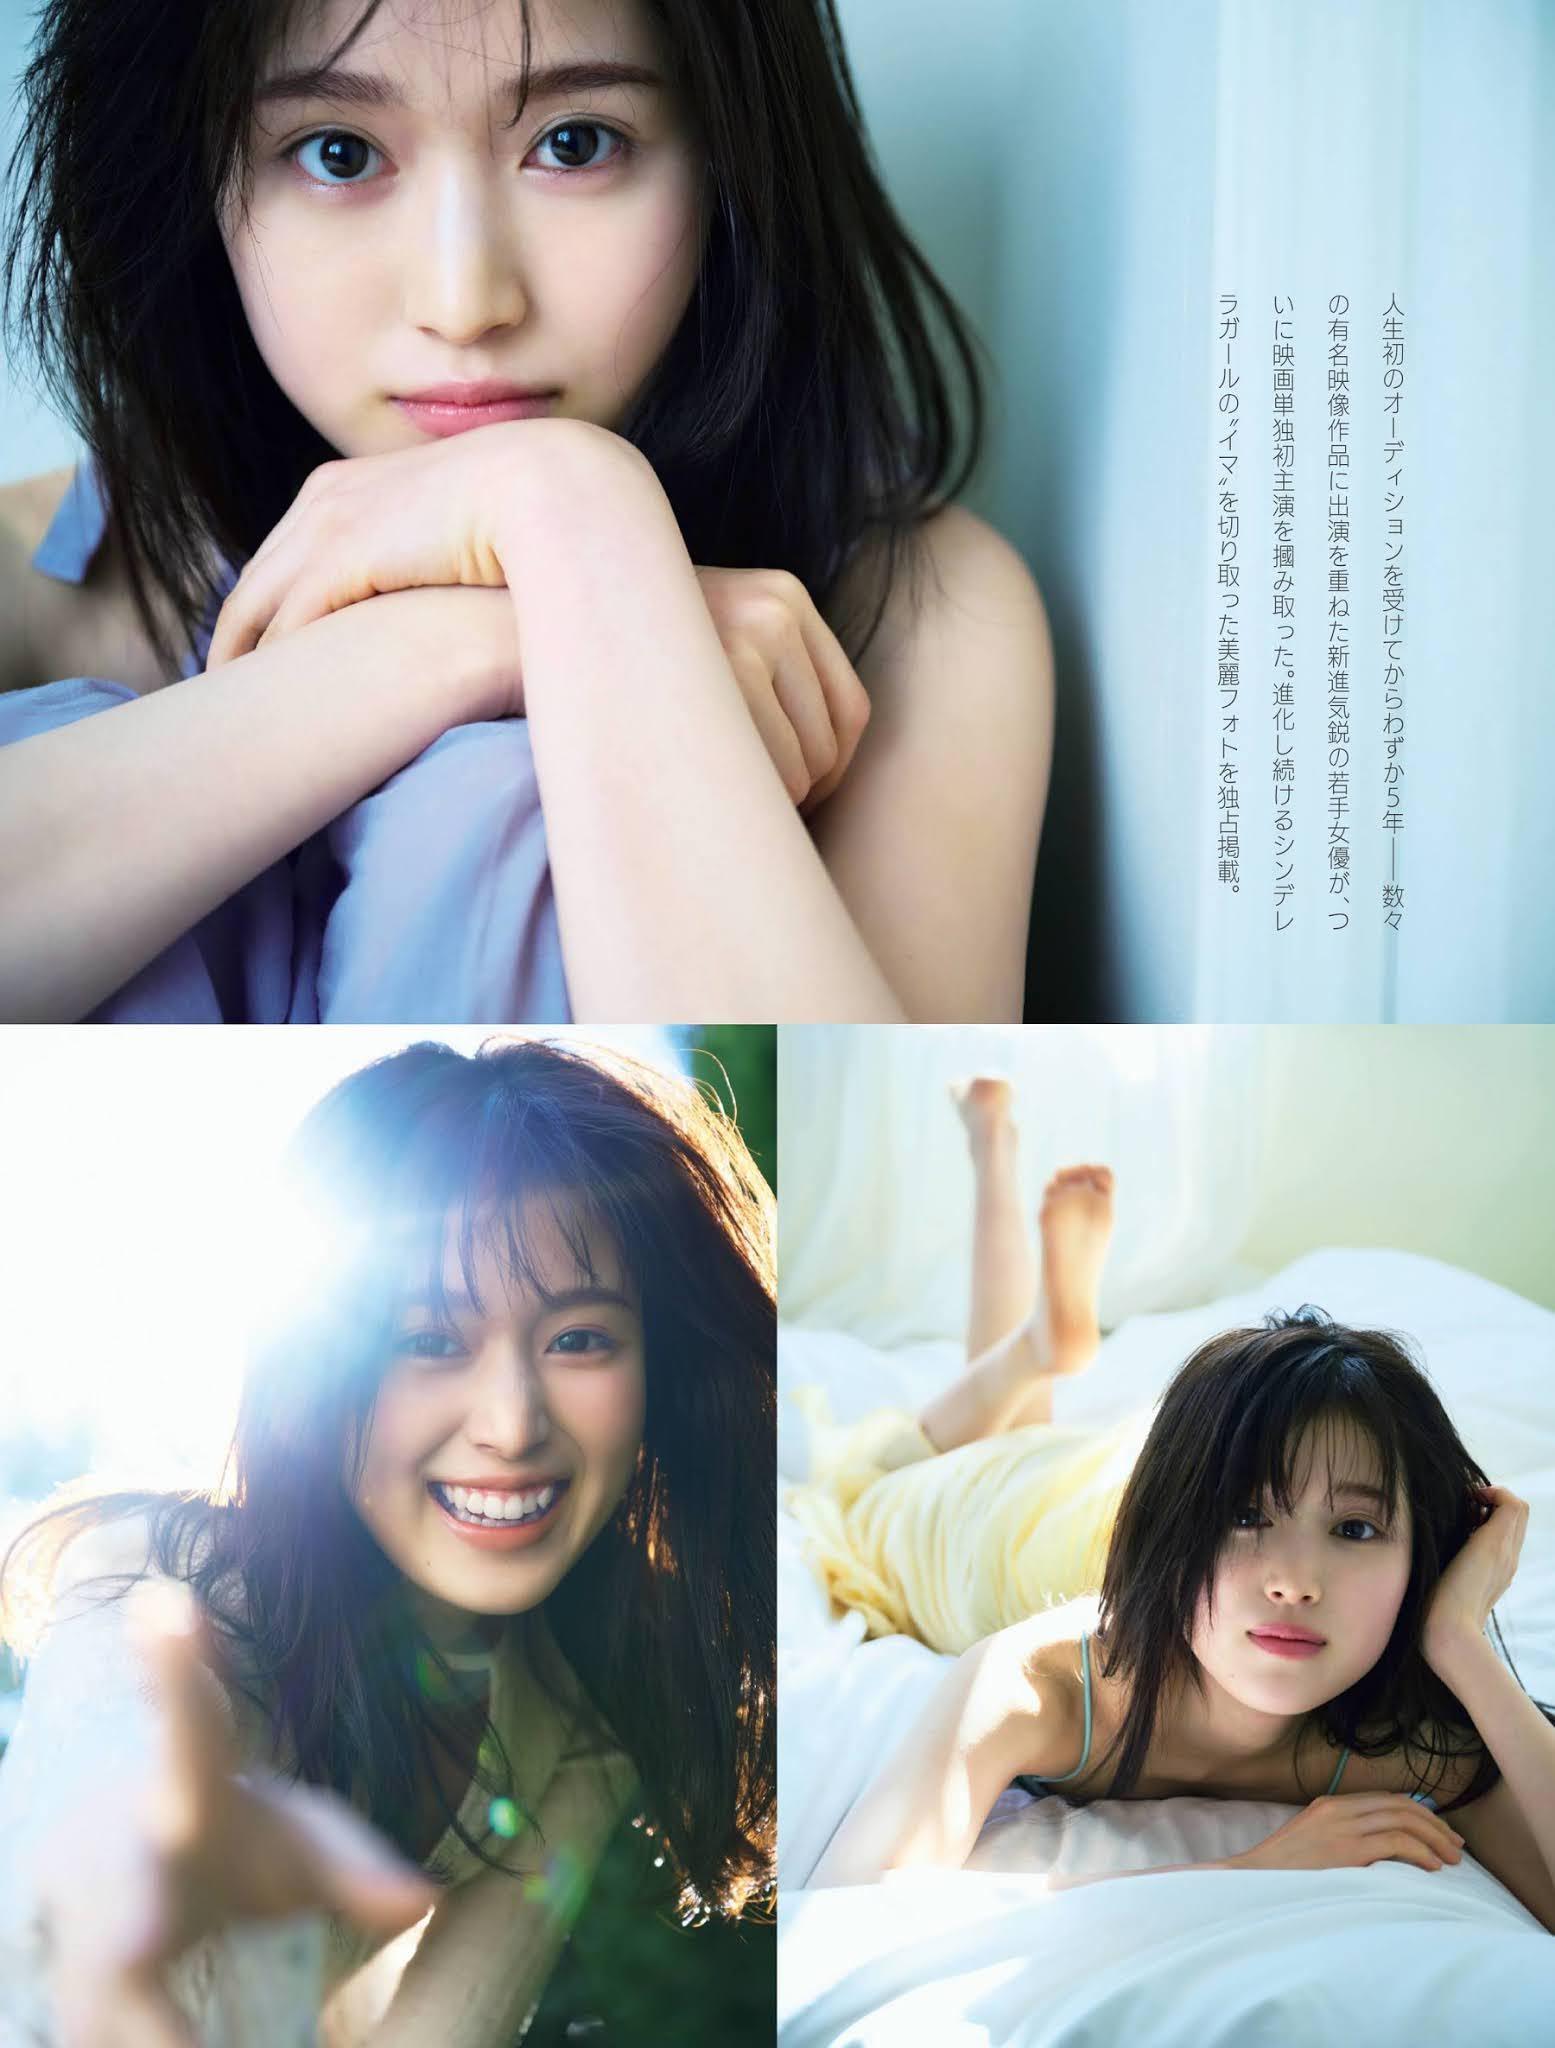 eyval.net : ふくもと りこ, 福本莉子, Fukumoto Riko - FRIDAY, 2021.05.28